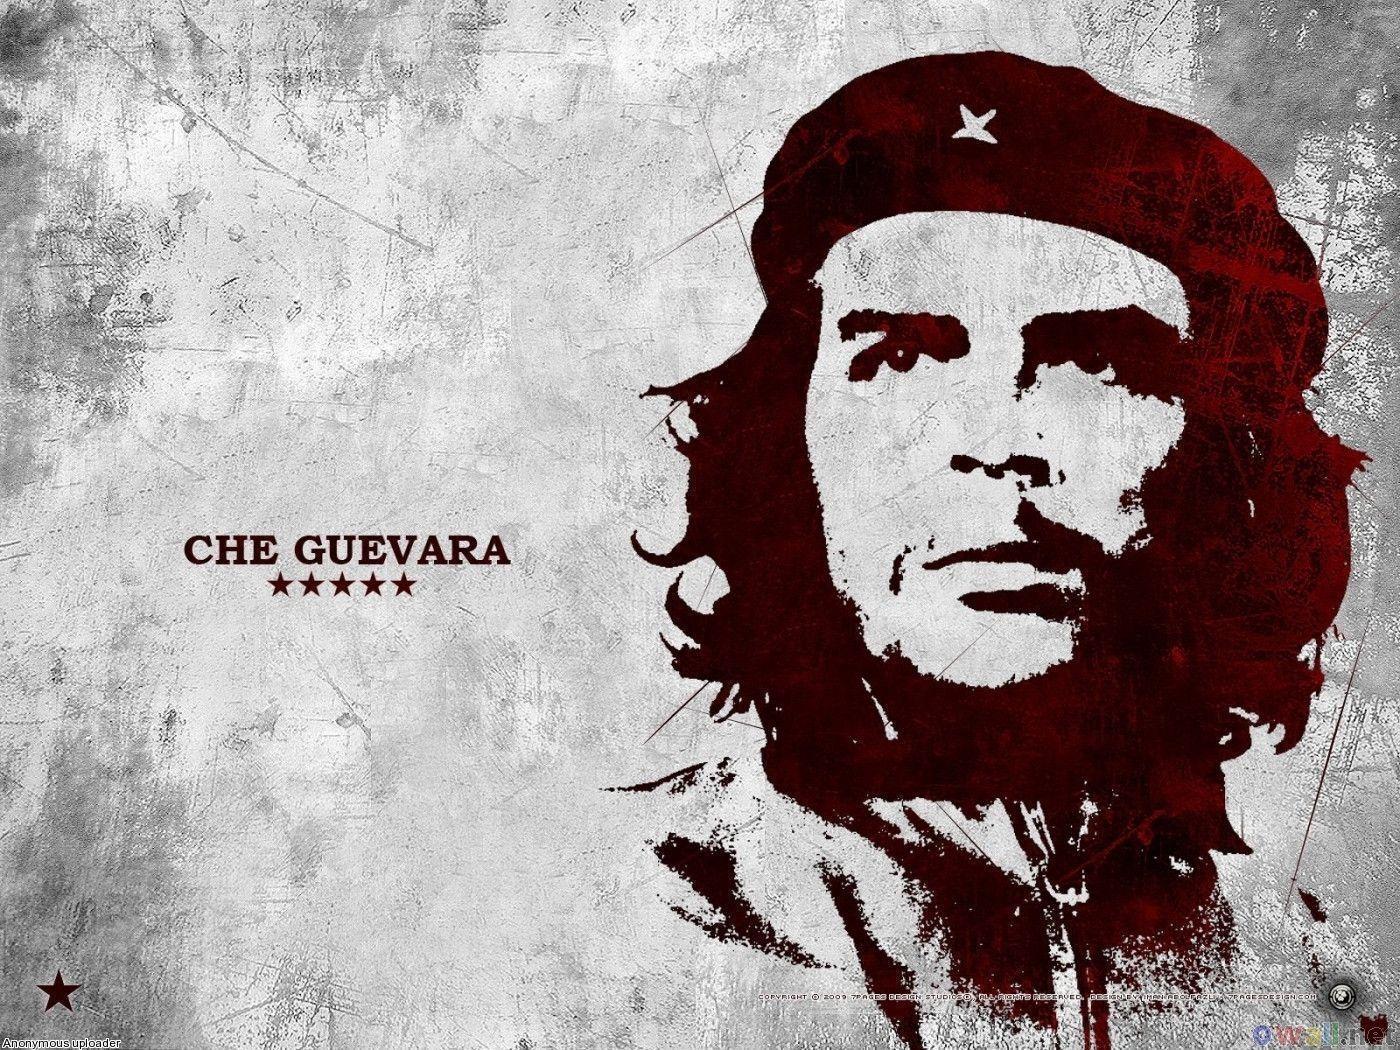 Che Guevara Wallpapers Wallpaper Cave